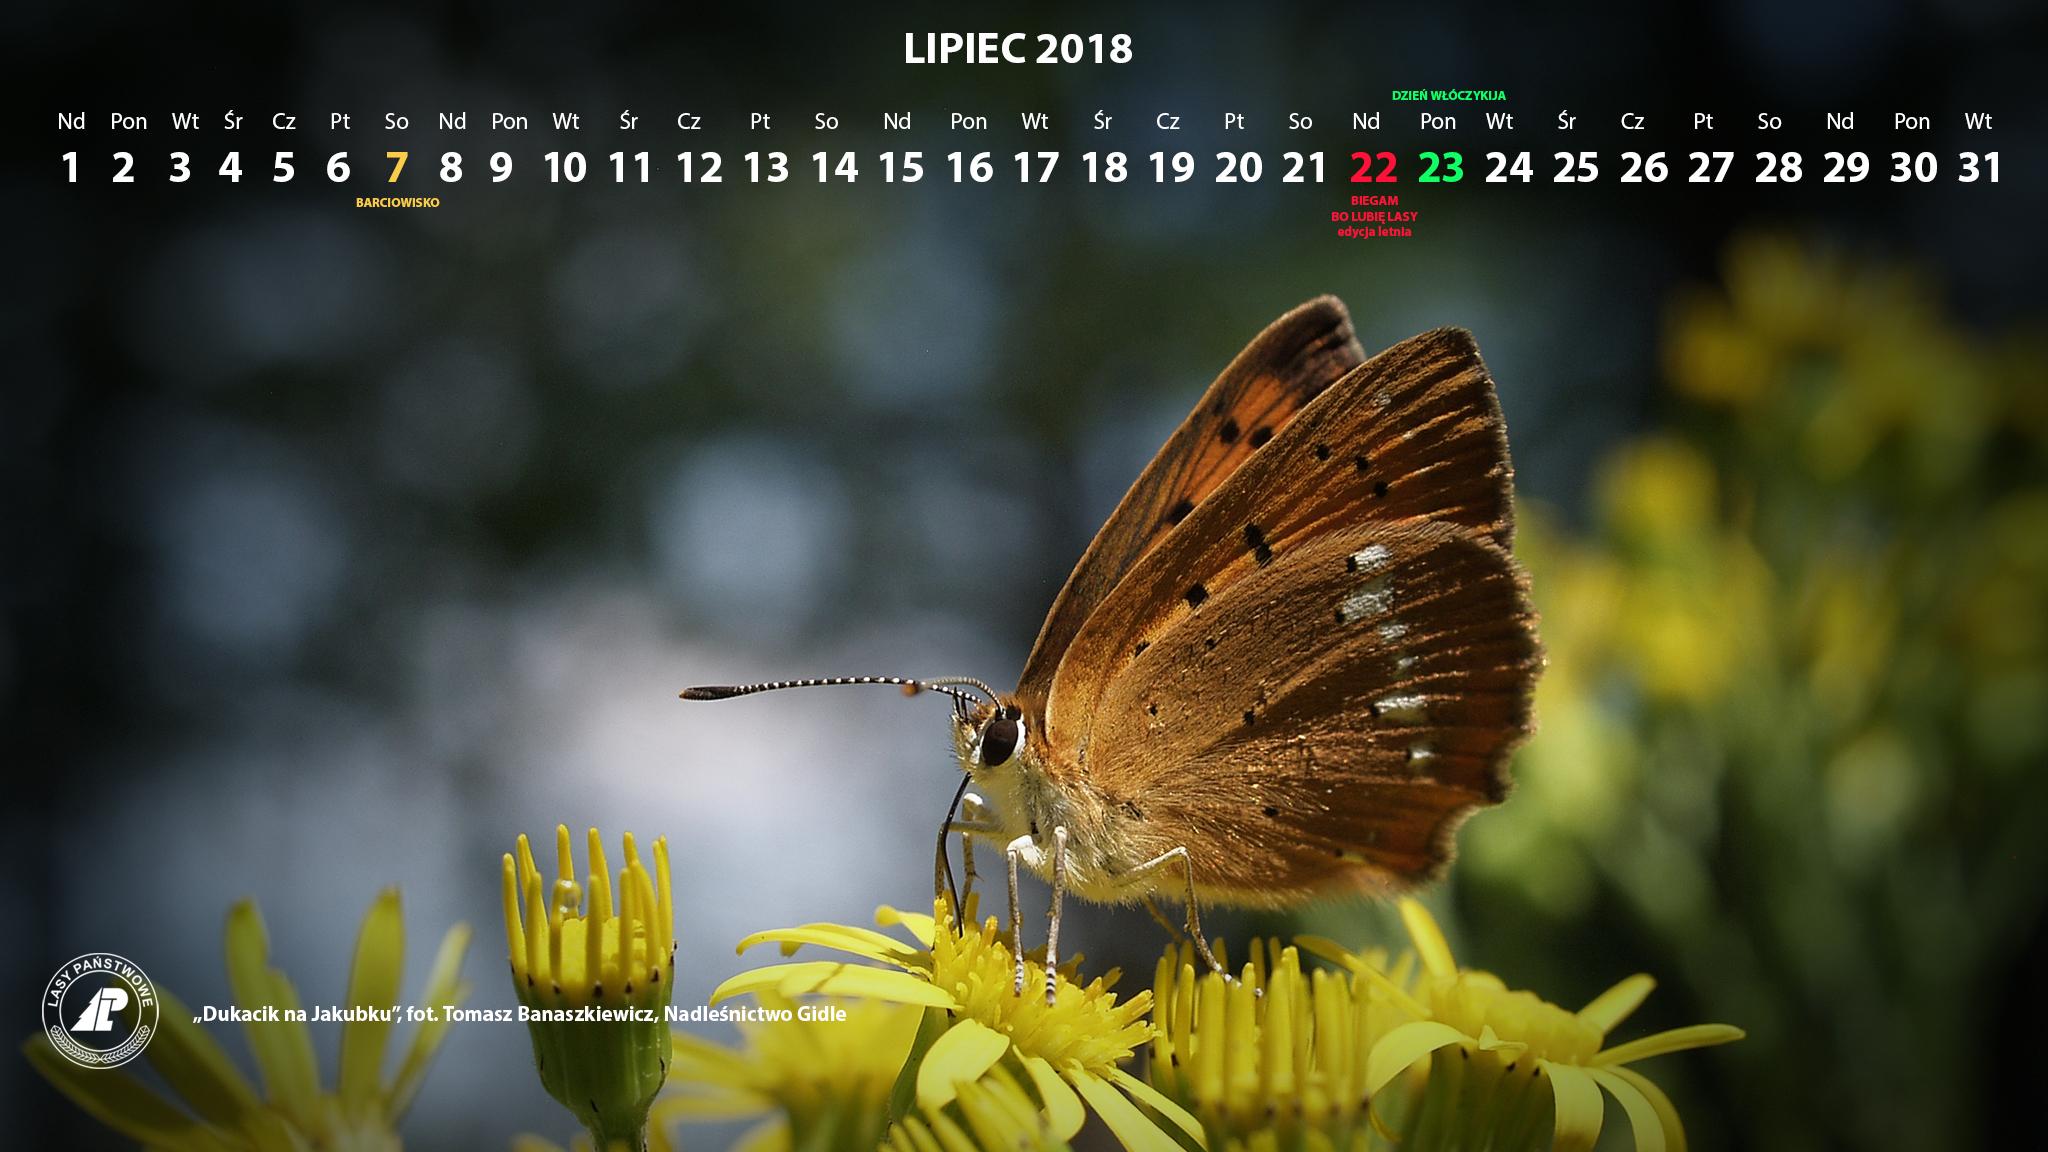 Kalendarz_lipiec_2018_2048x1152[1].jpg